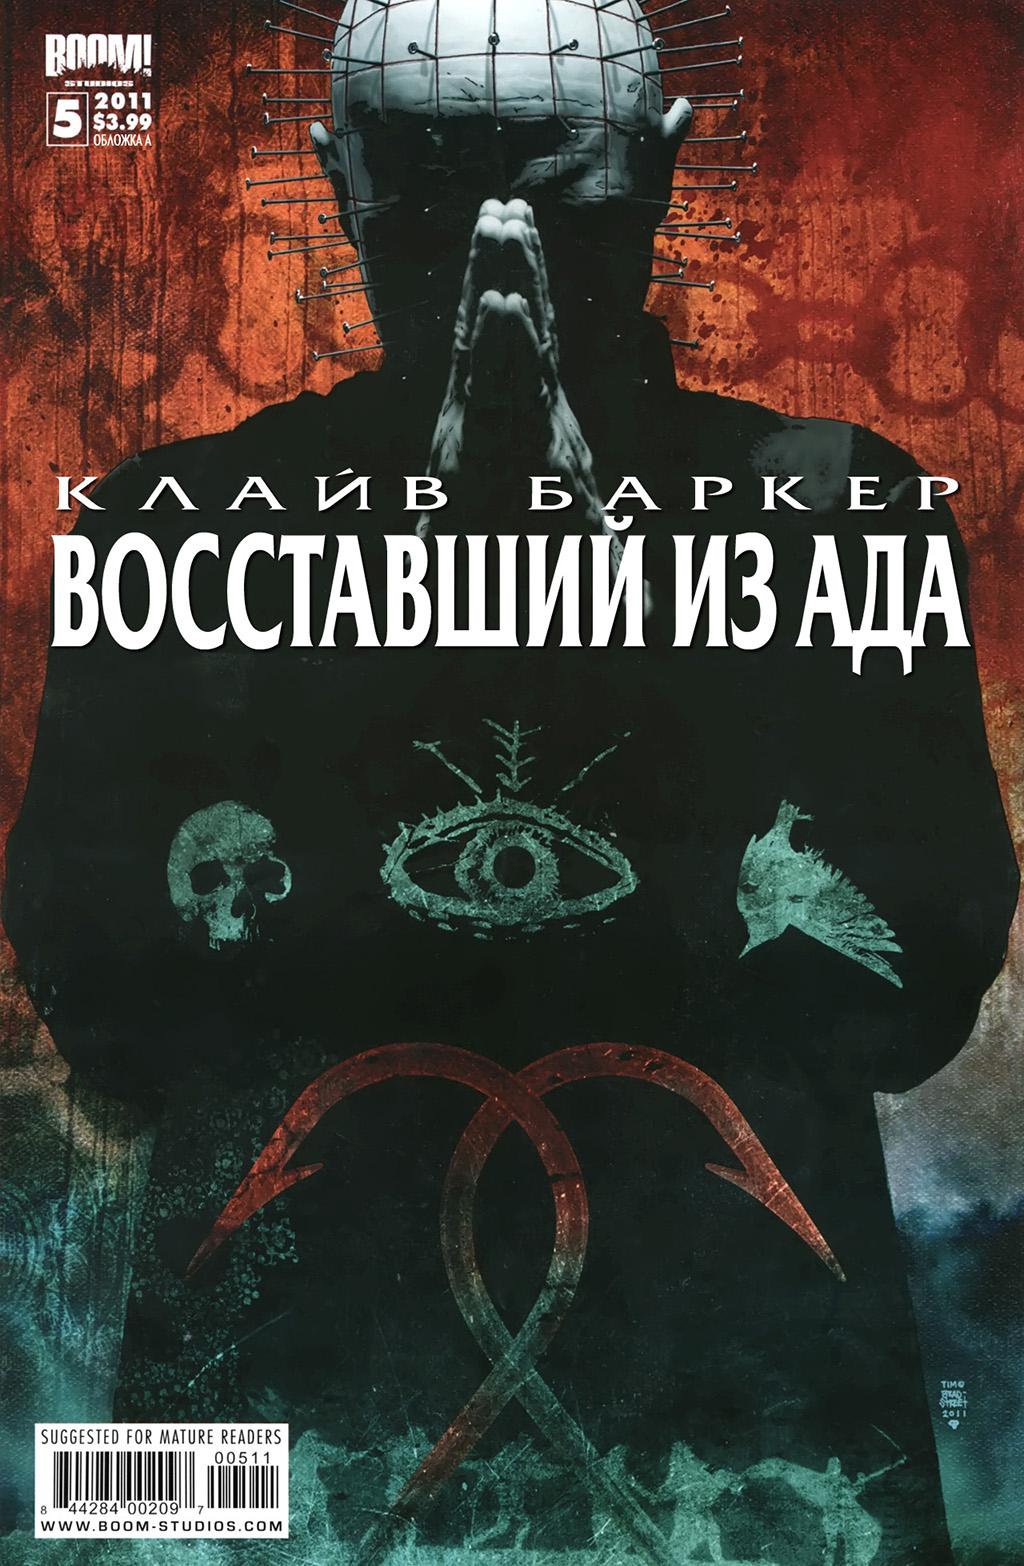 Комикс Клайв Баркер Восставший из ада